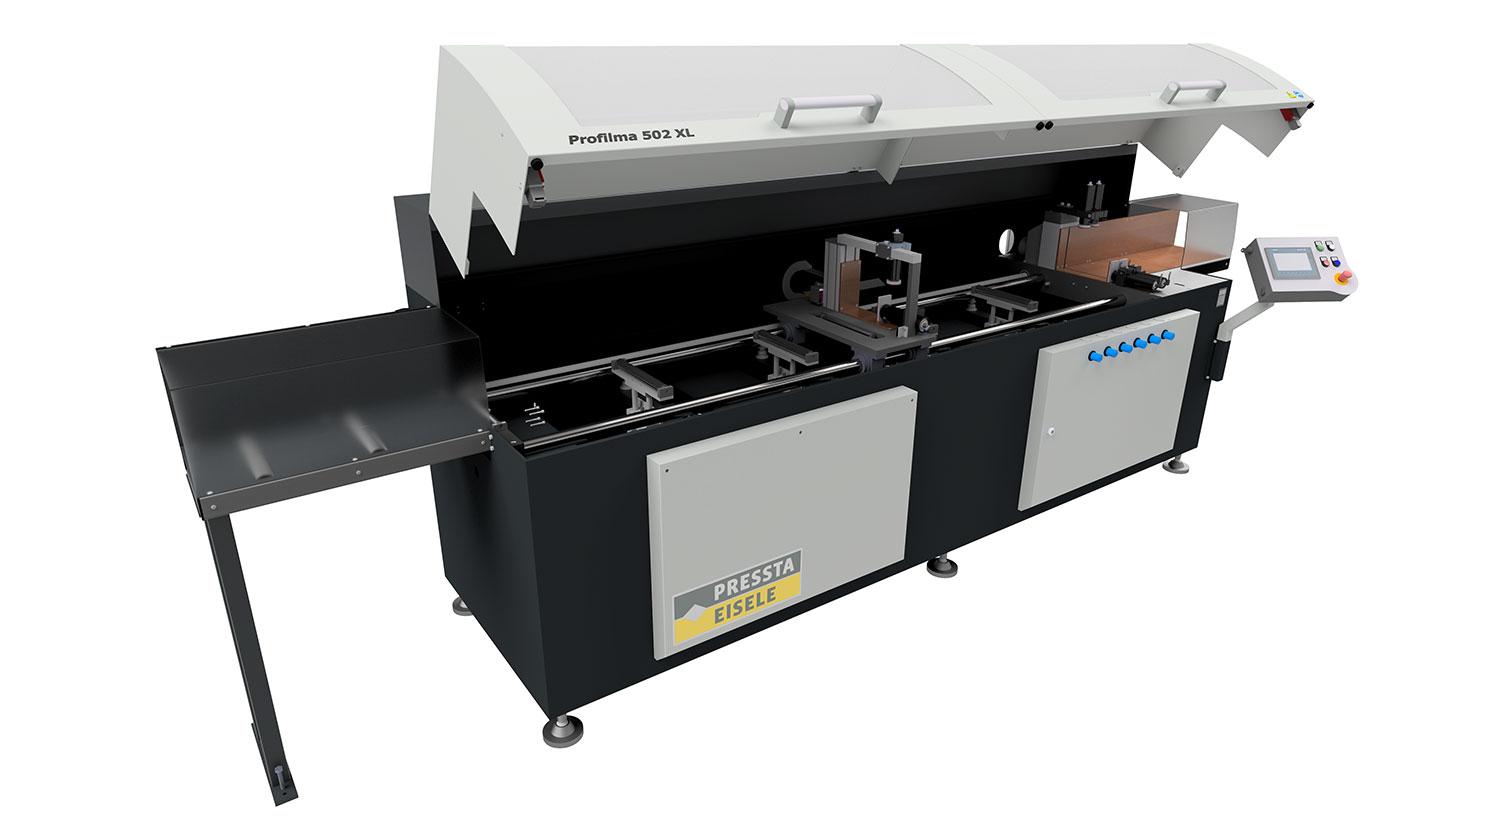 INT aluminum automatic saw Pressta Eisele Profilma 502 XL